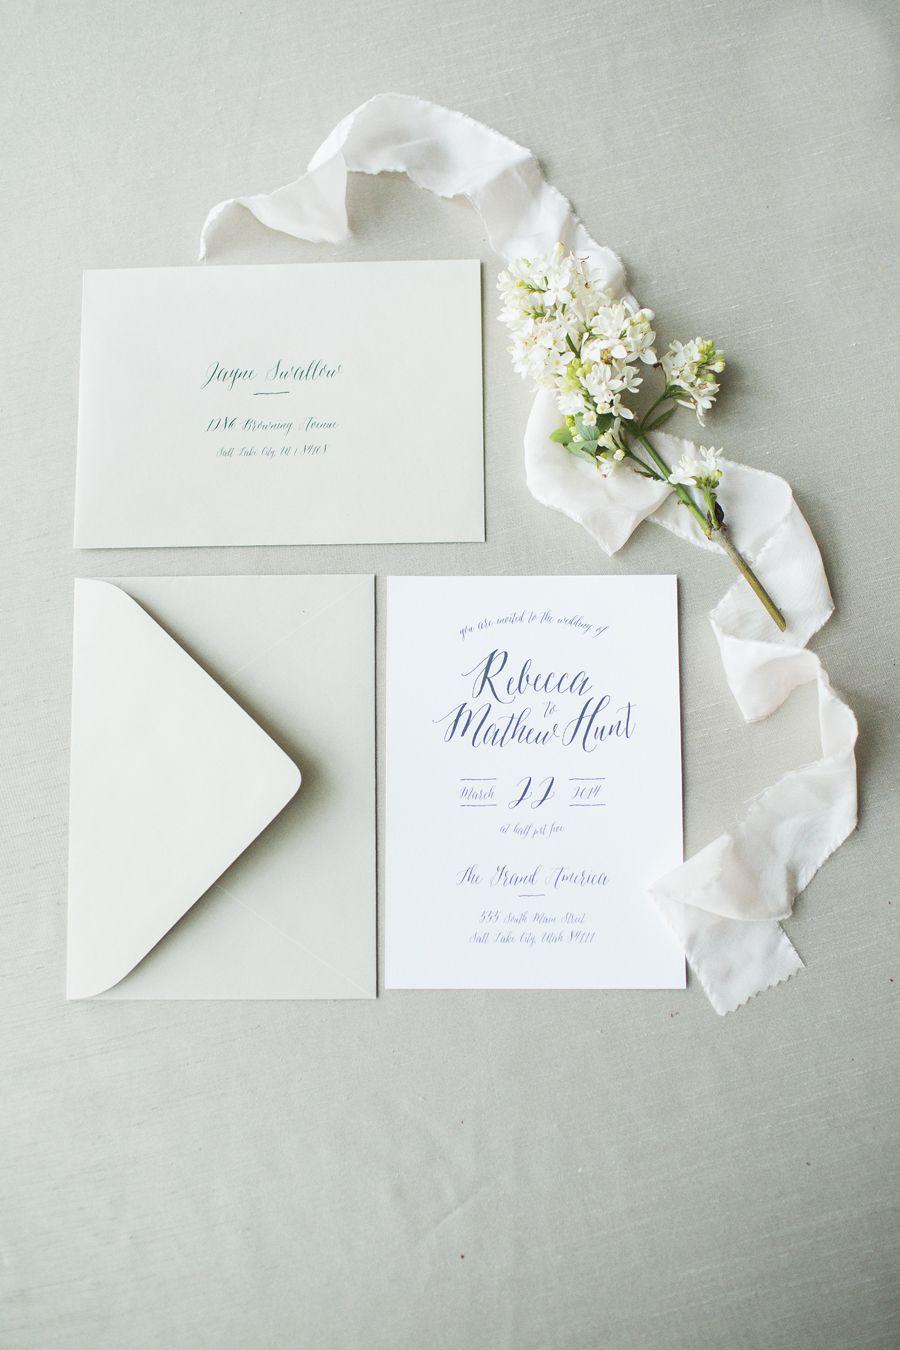 Modern Classic Wedding Invitations | Classic weddings, Weddings and ...